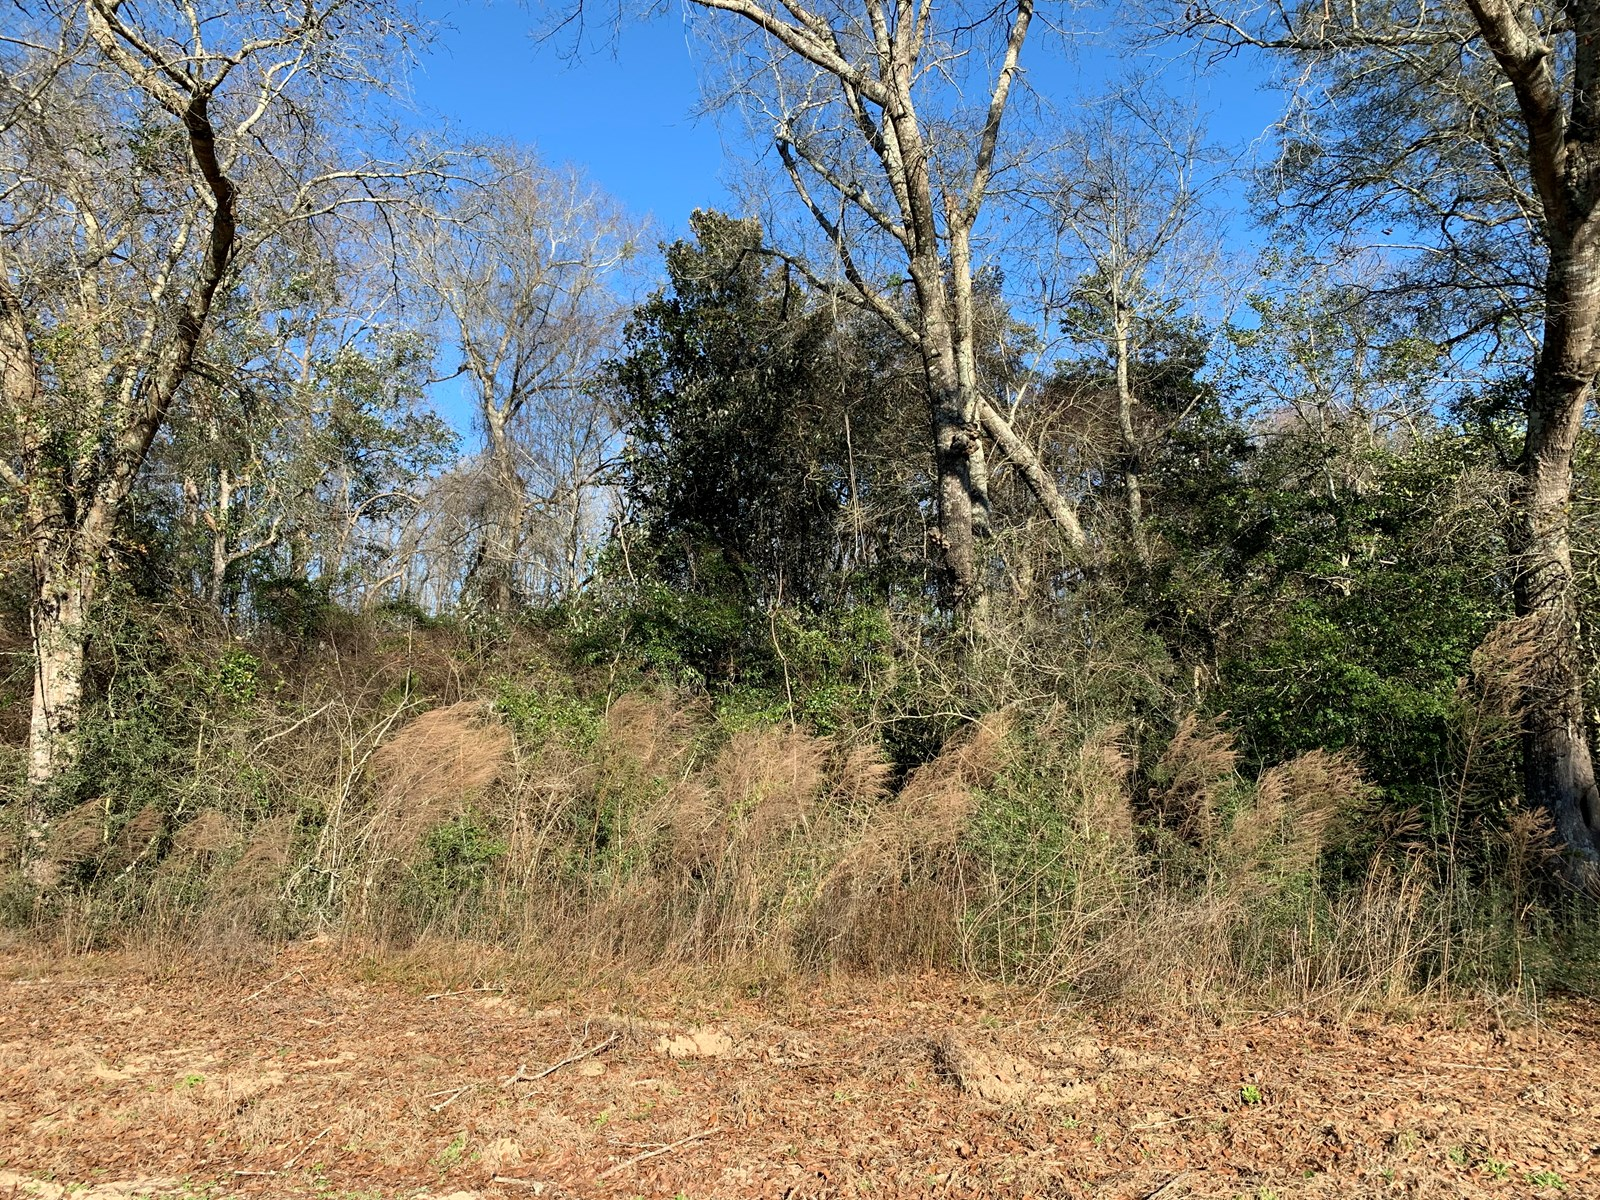 Land For Sale in Geneva County, Alabama